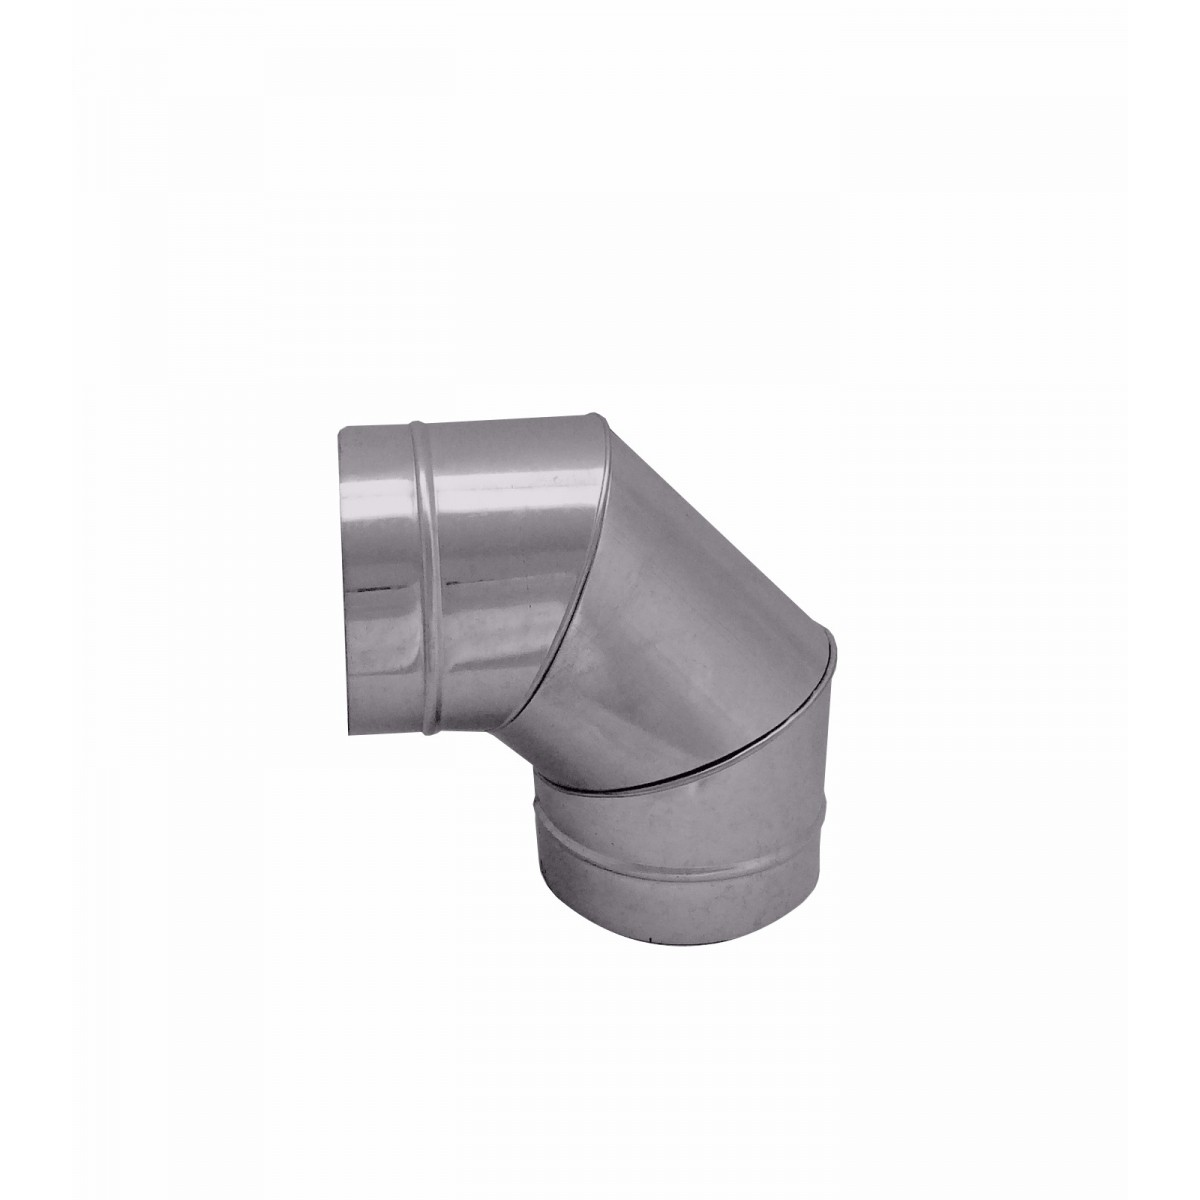 Curva / cotovelo galvanizada 90° de 30 cm de diâmetro  - Galvocalhas